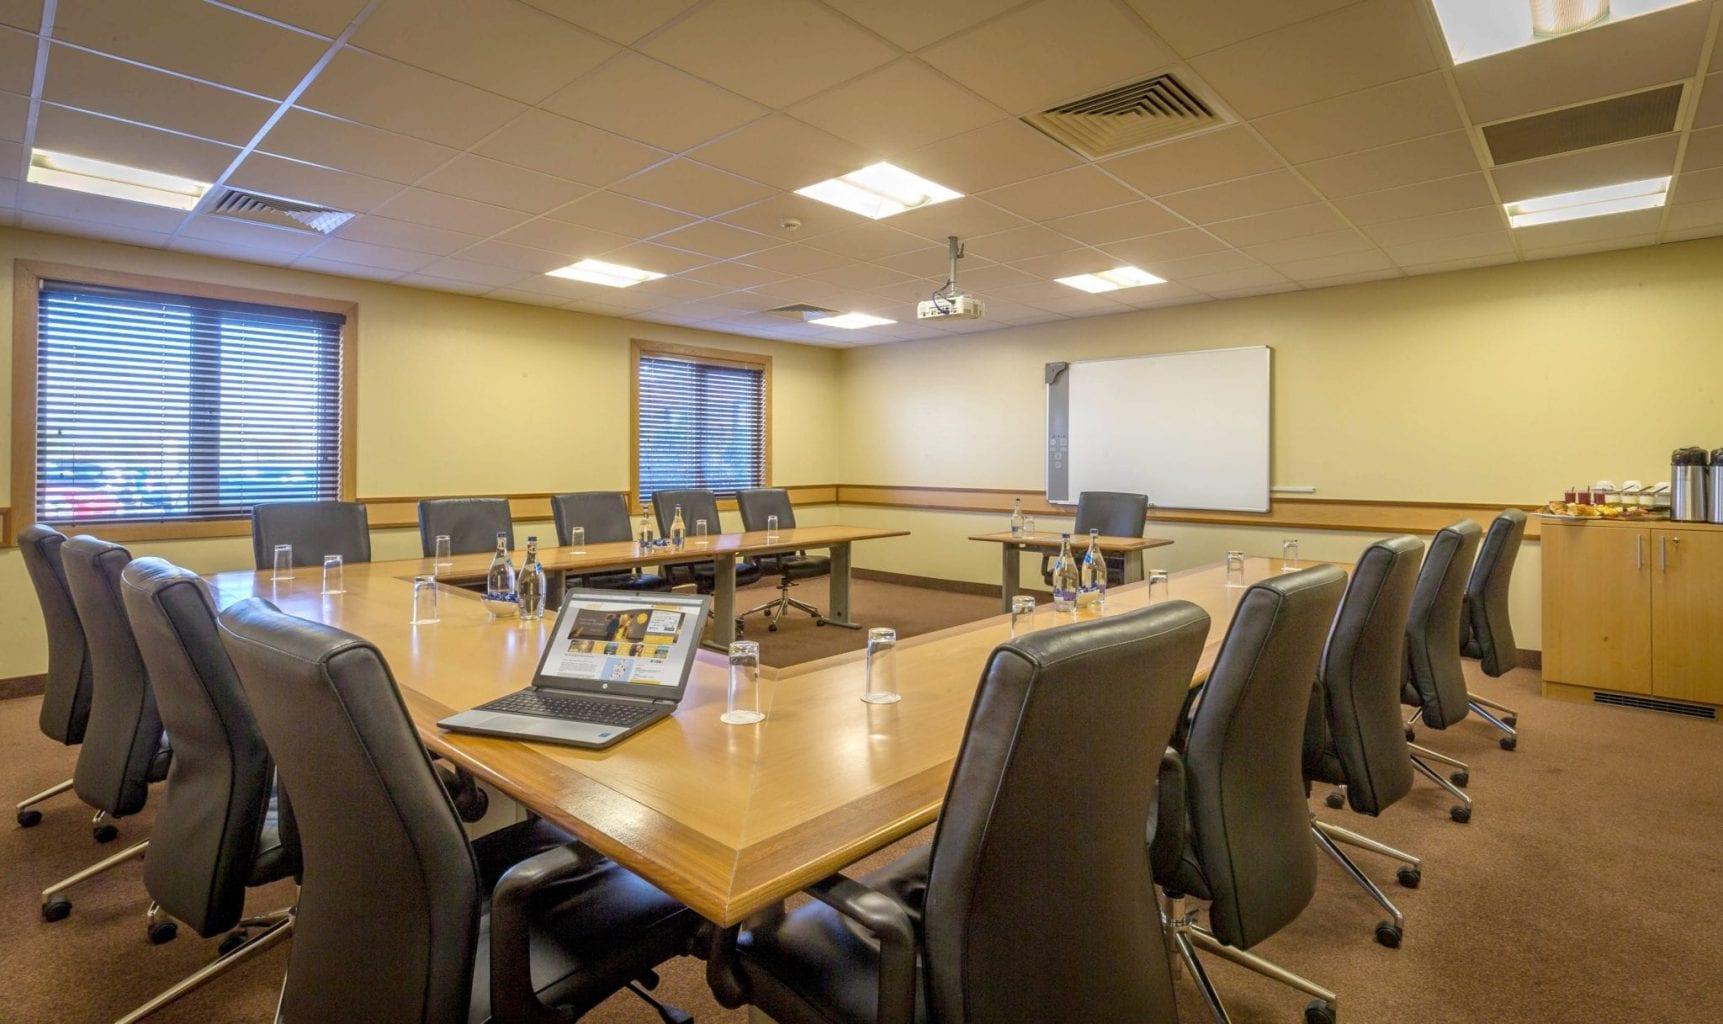 Meeting in Maldron Hotel Newlands Cross